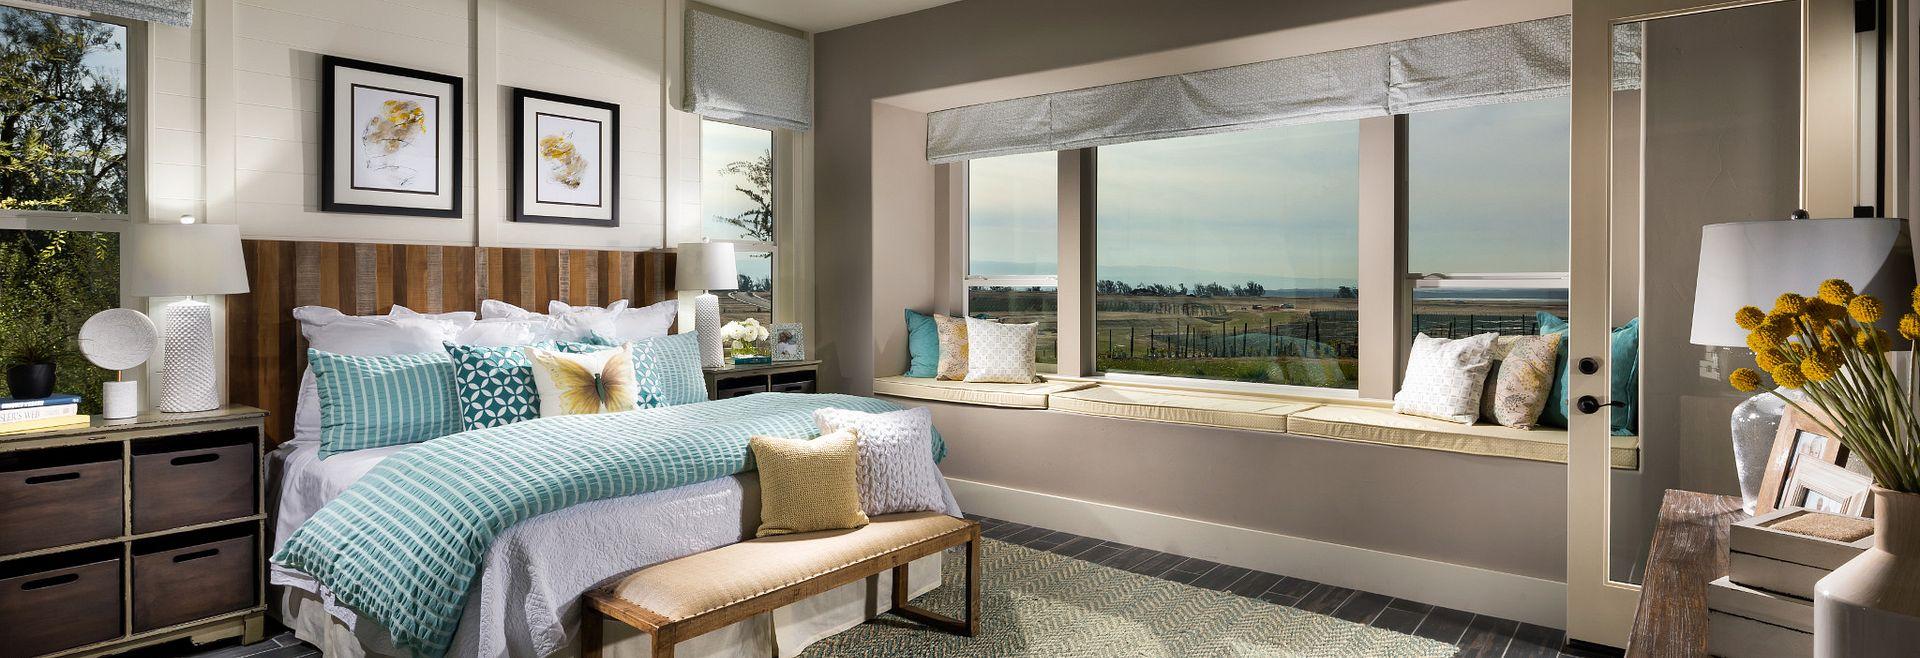 Trilogy Monarch Dunes Ventana Master Bedroom